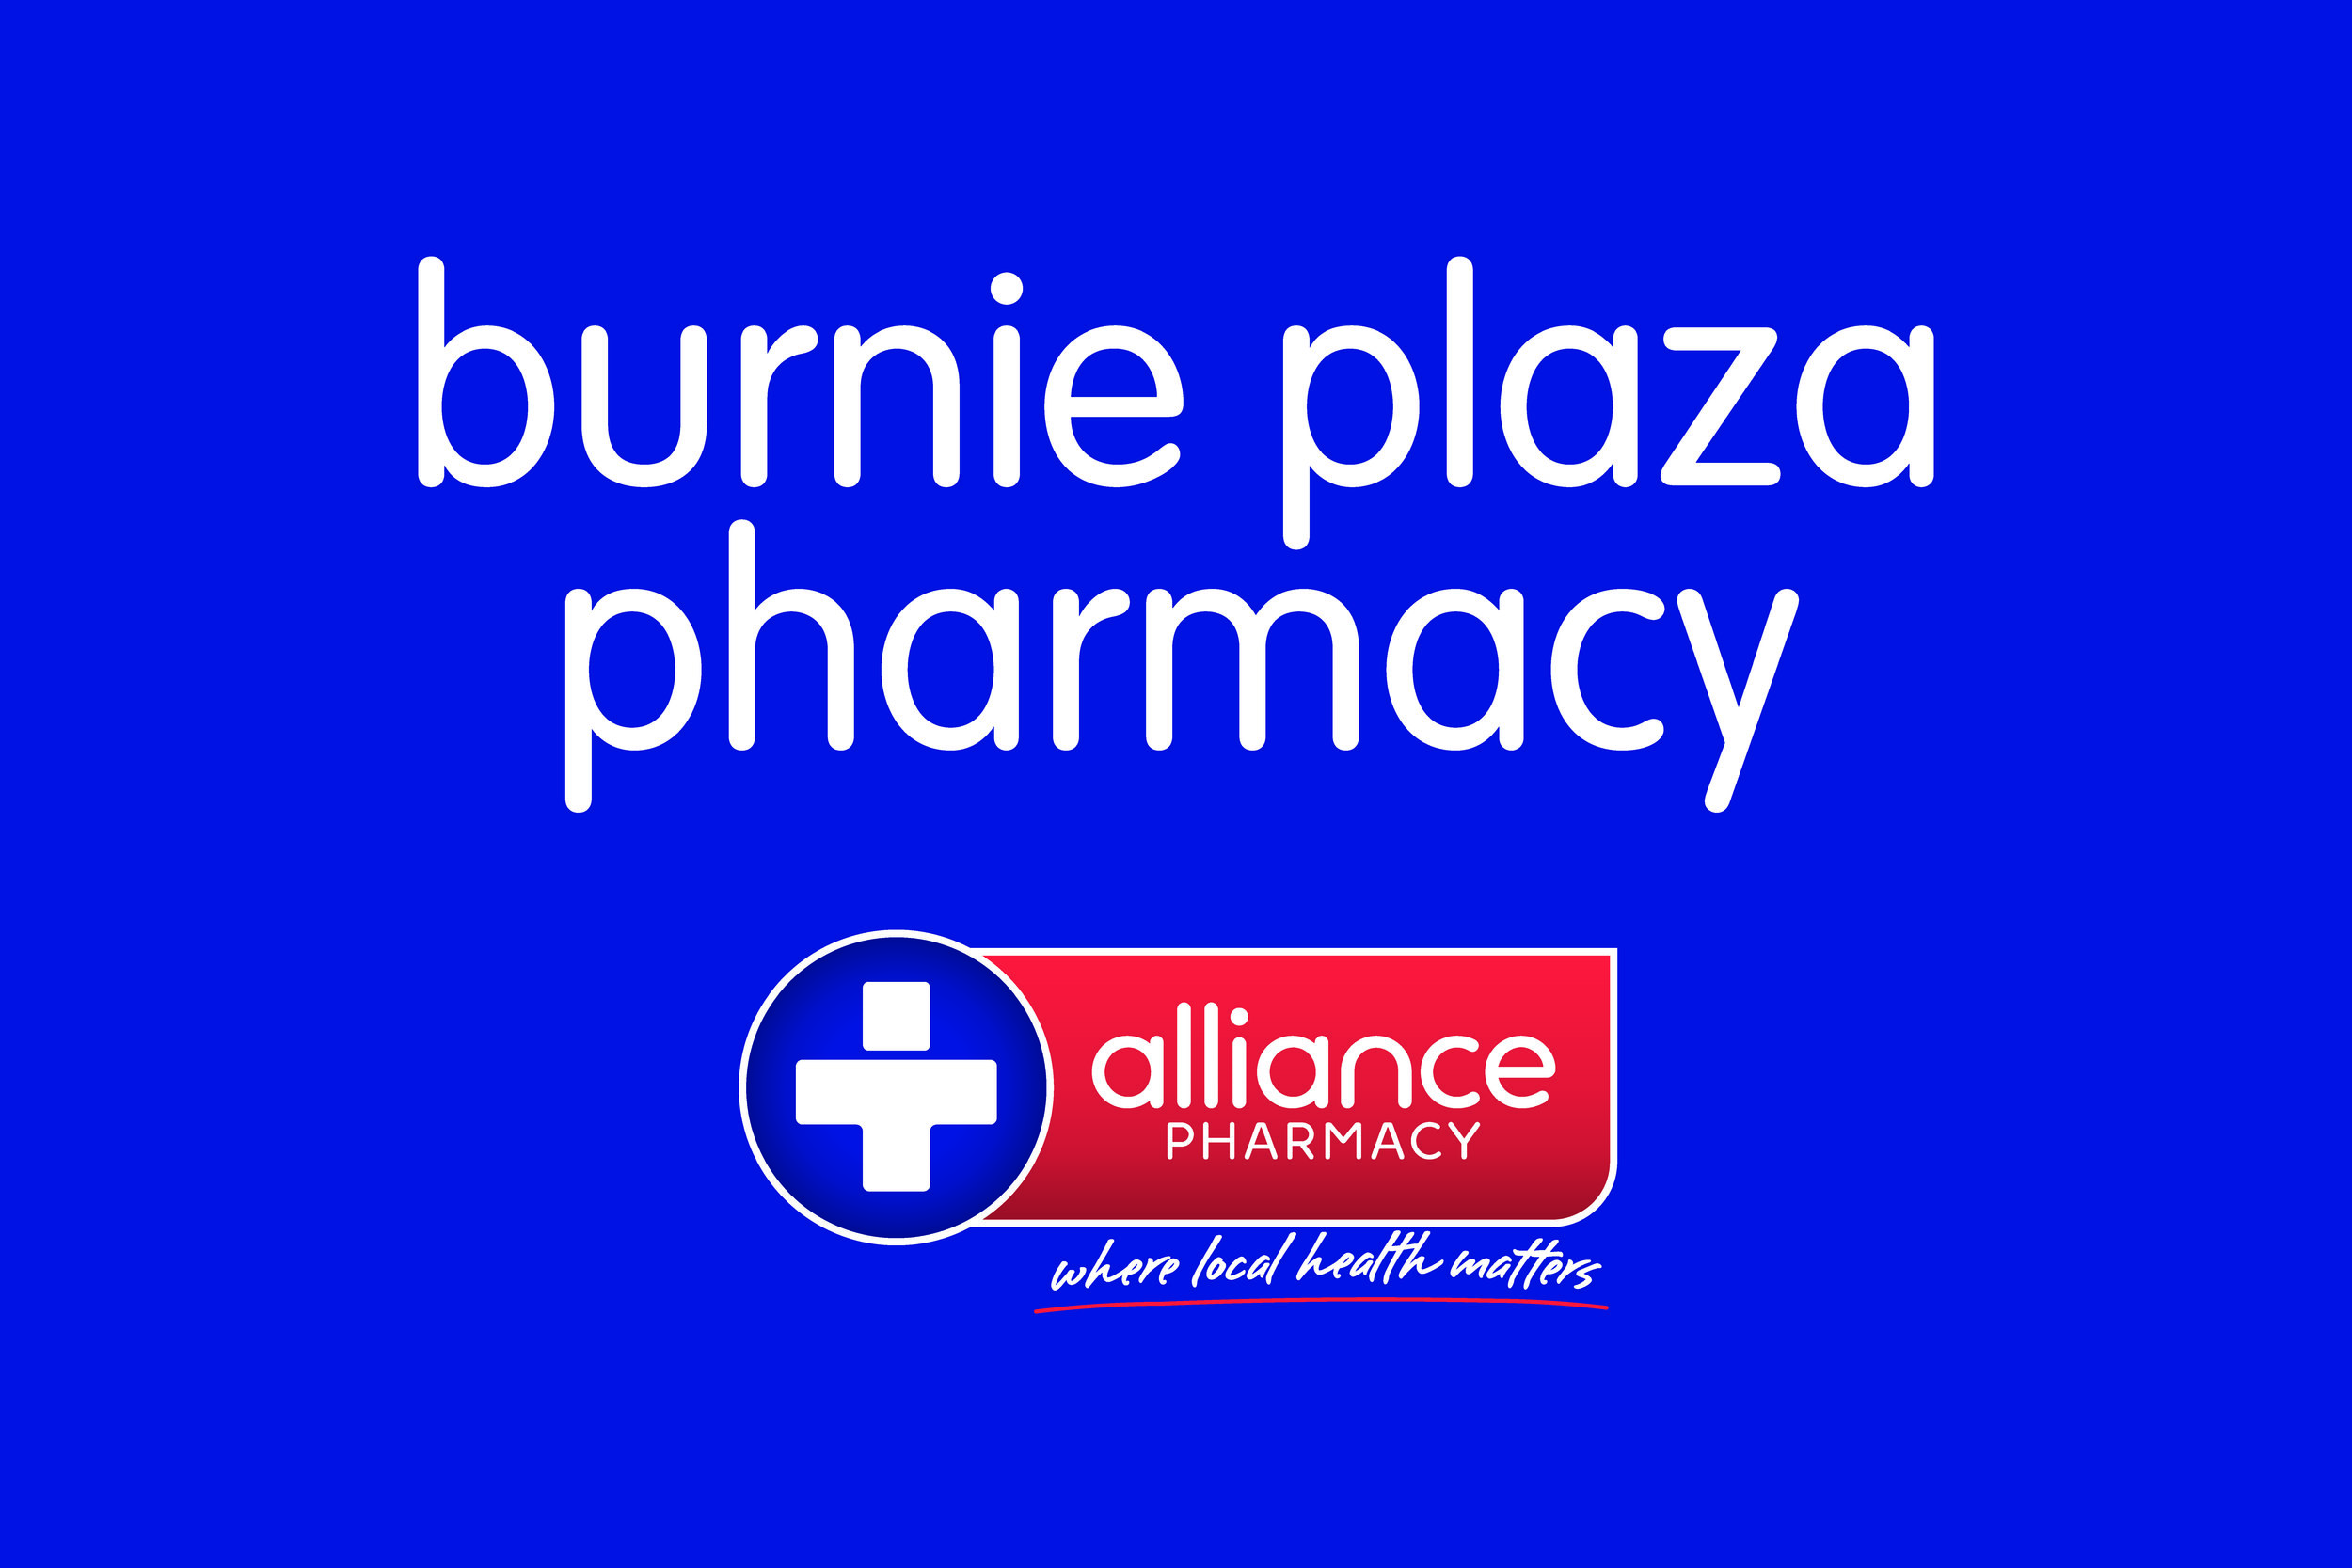 Burnie Plaza Pharmacy 1200x800mm PRINT.jpg